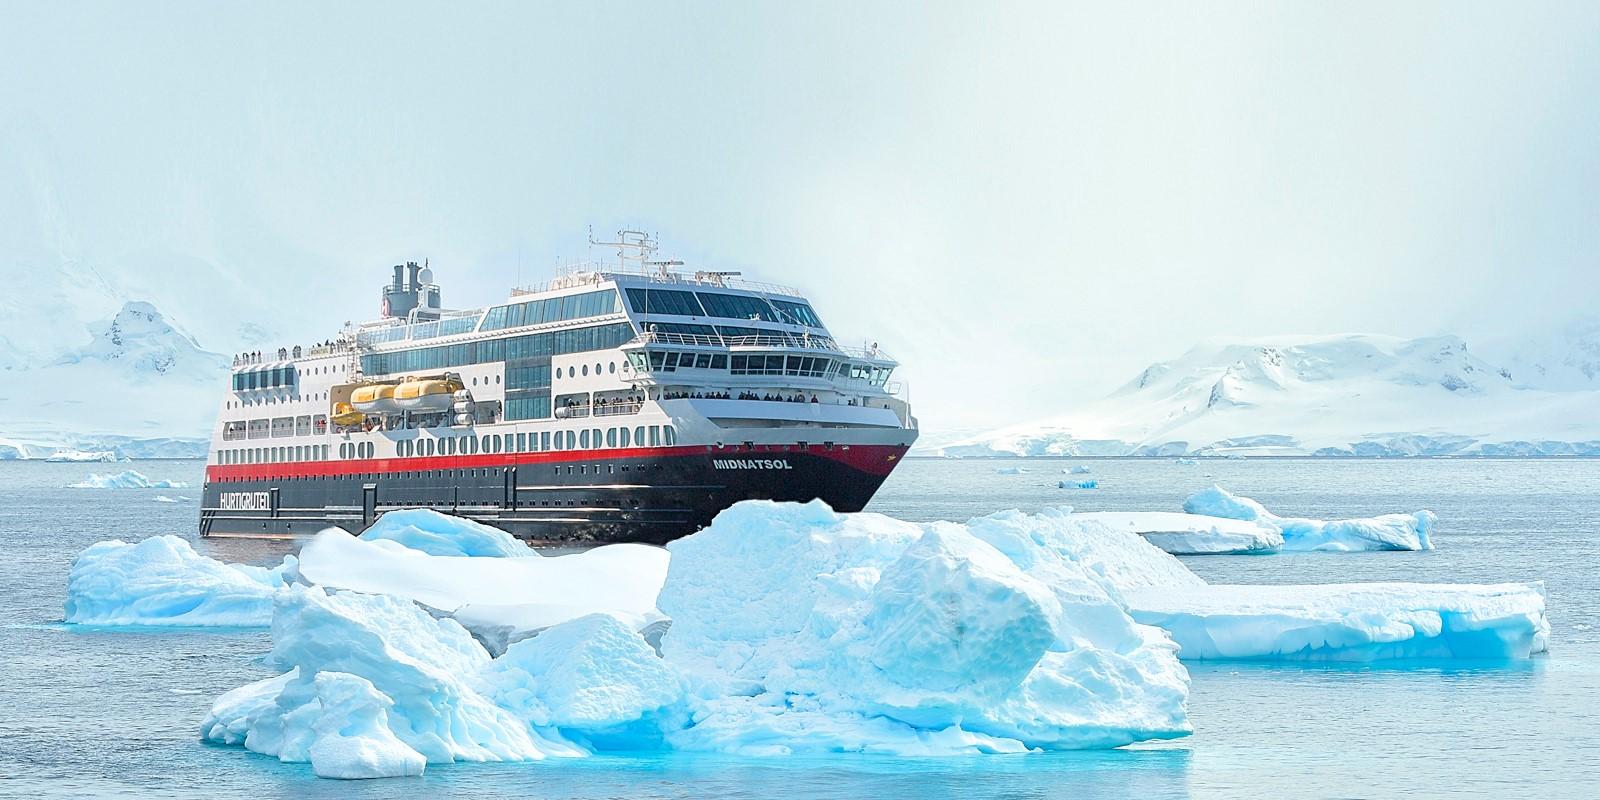 Bilderesultat for ms midnatsol antarktis